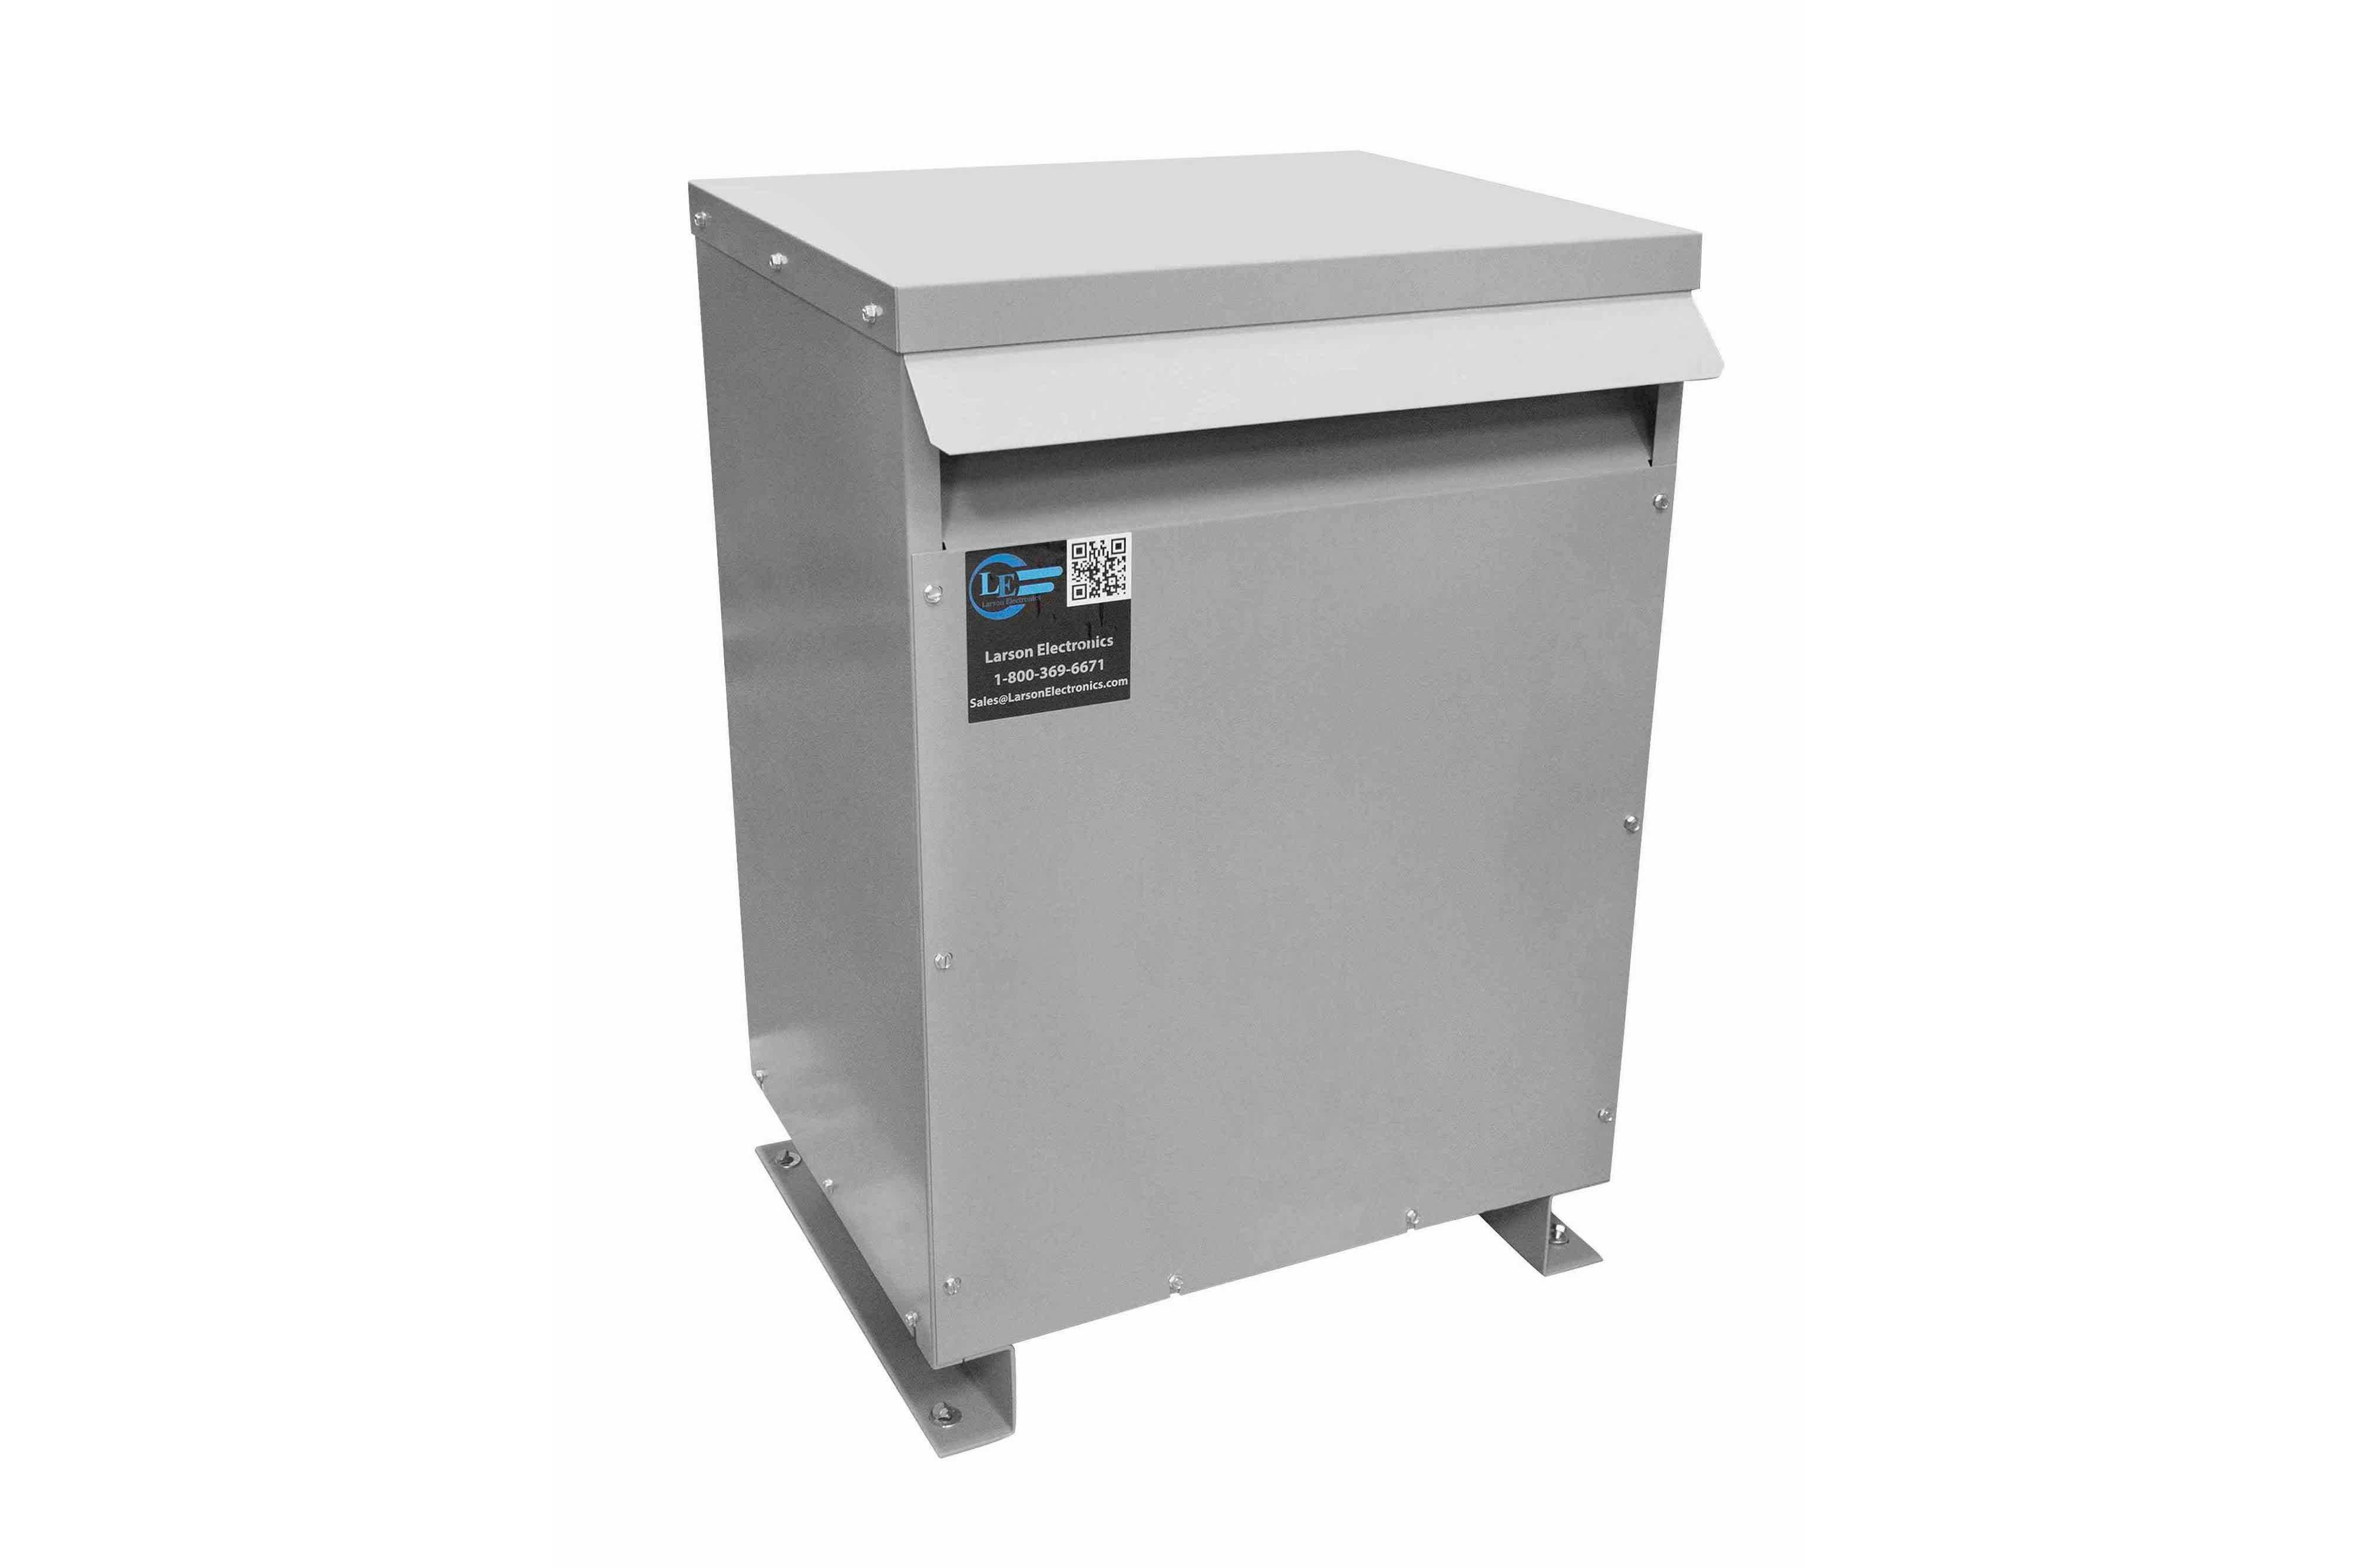 400 kVA 3PH DOE Transformer, 415V Delta Primary, 208Y/120 Wye-N Secondary, N3R, Ventilated, 60 Hz